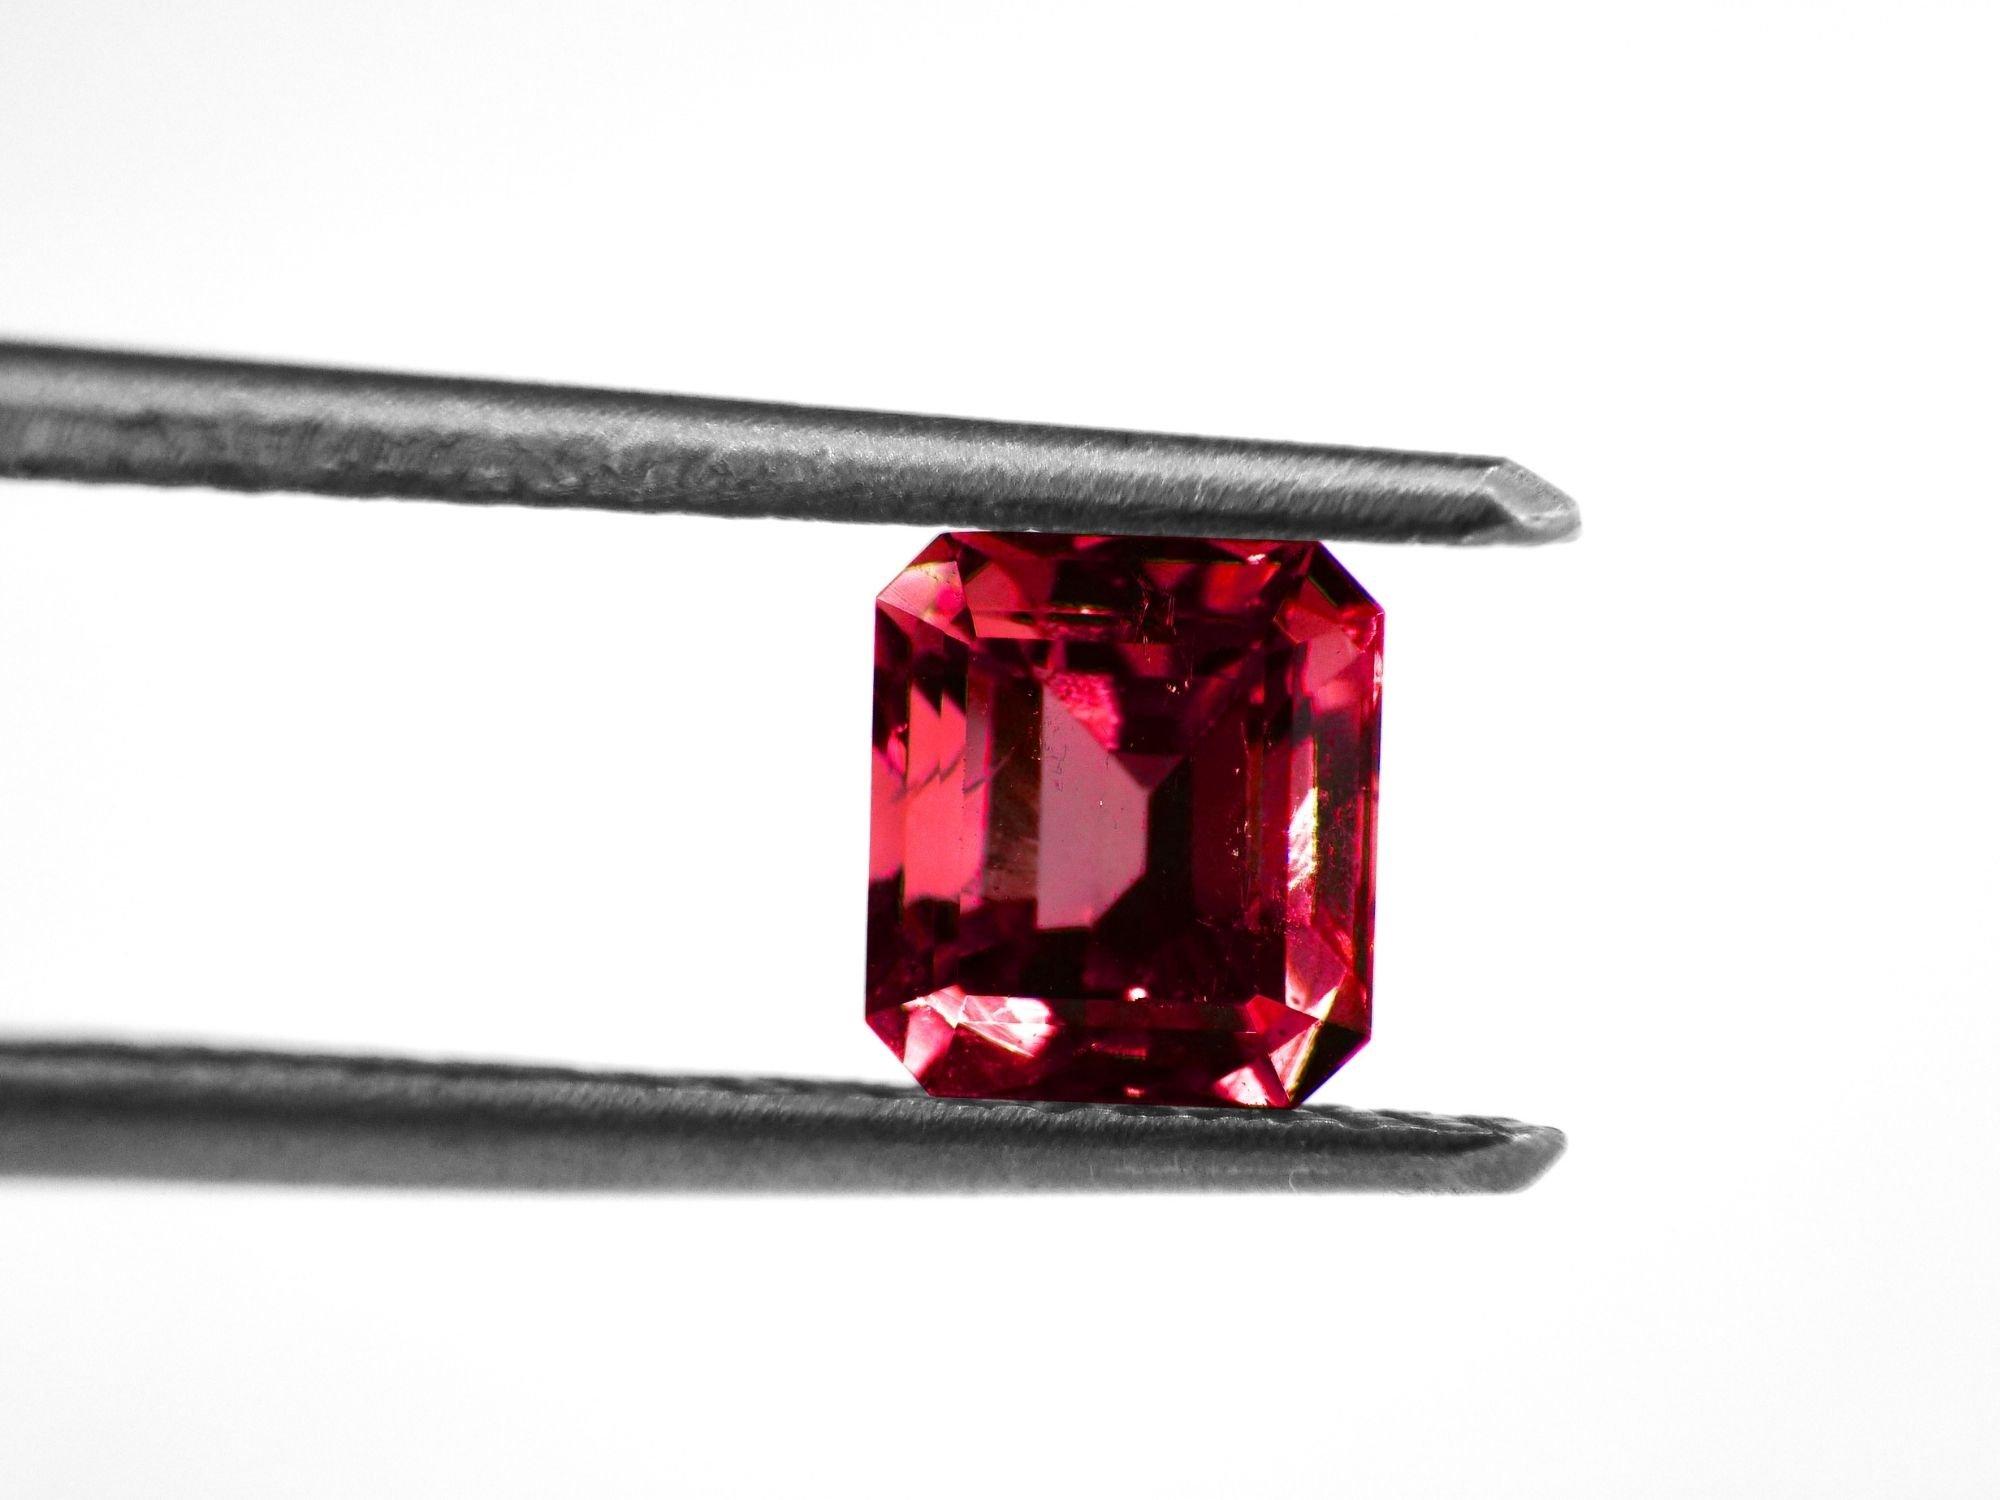 Lab-Created Rubies Vs Natural Rubies | Diamond Buzz